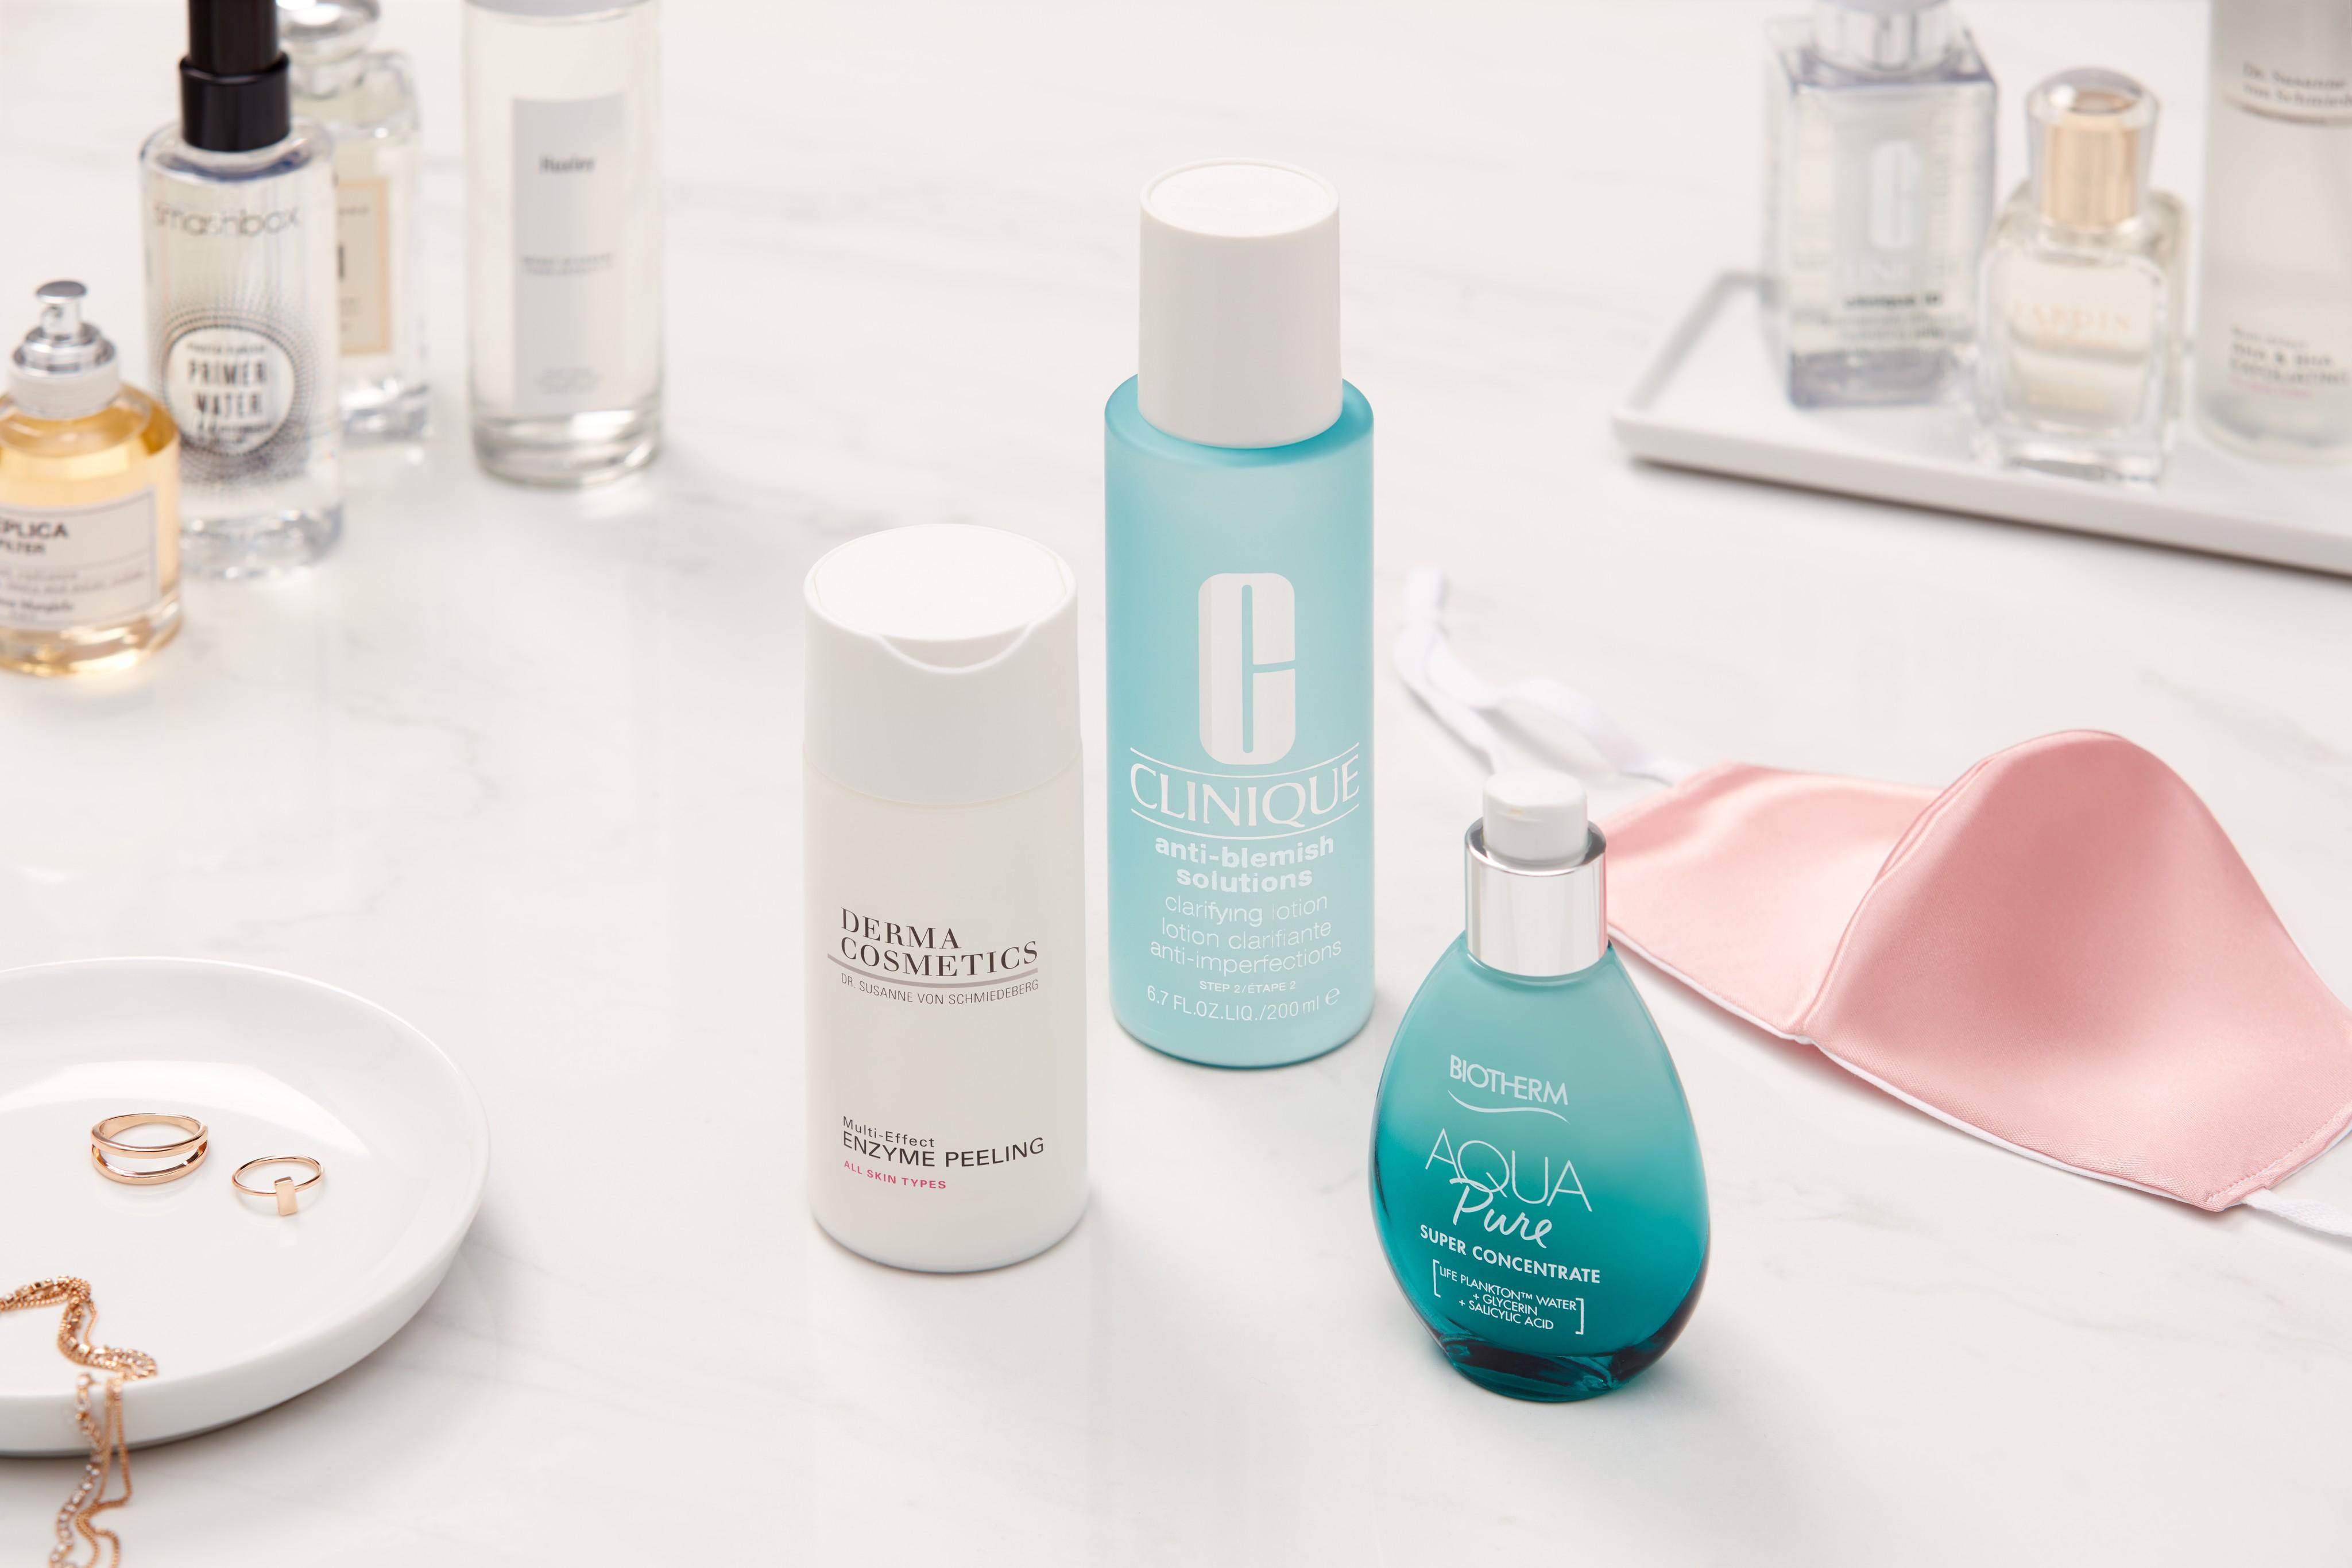 Skincare-products-lifestyle-maske-dermacosmetics-clinique-biotherm-unlimited-Web-Rendition